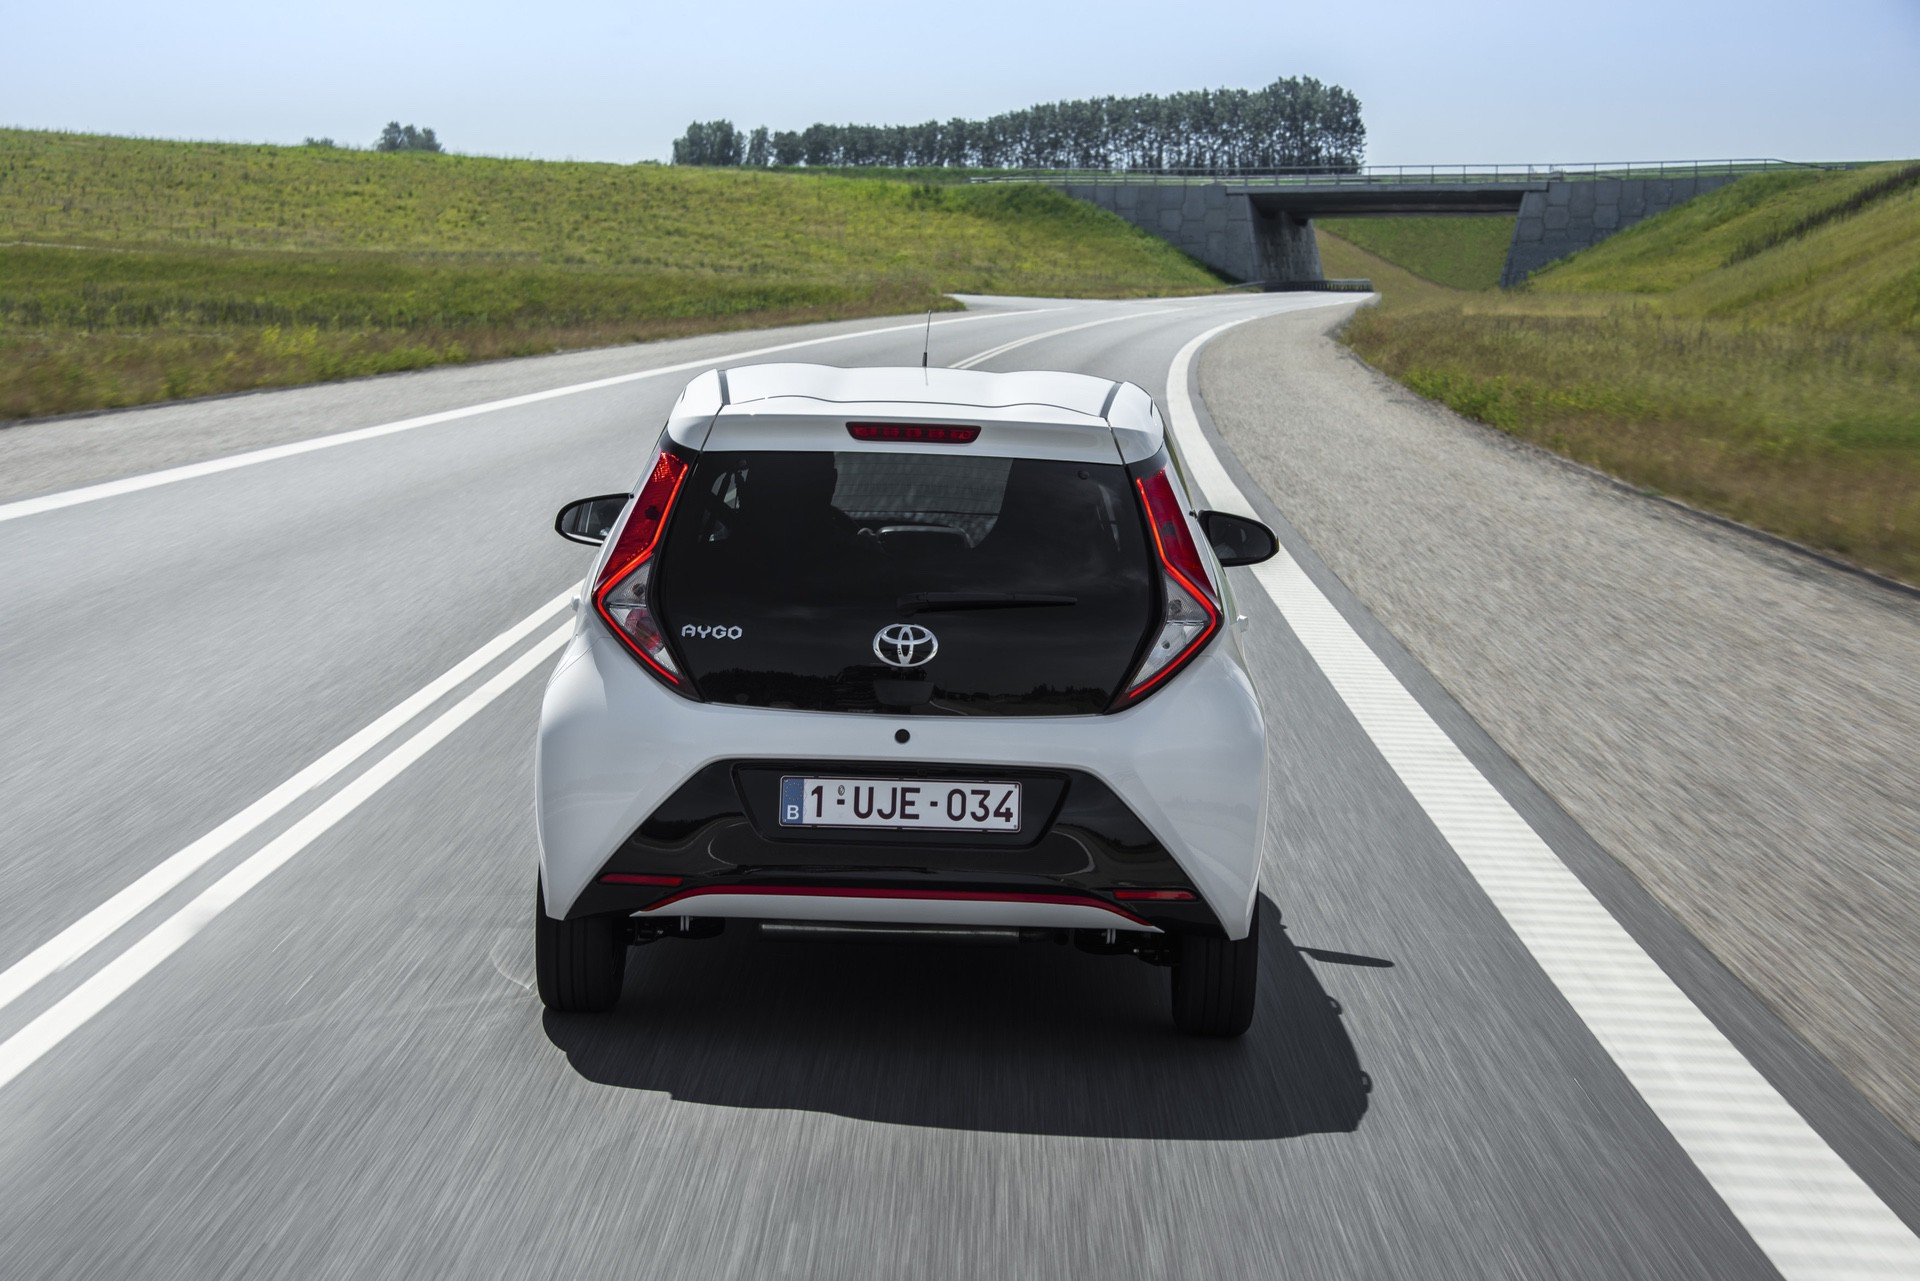 Toyota_Aygo_facelift_presskit_0058